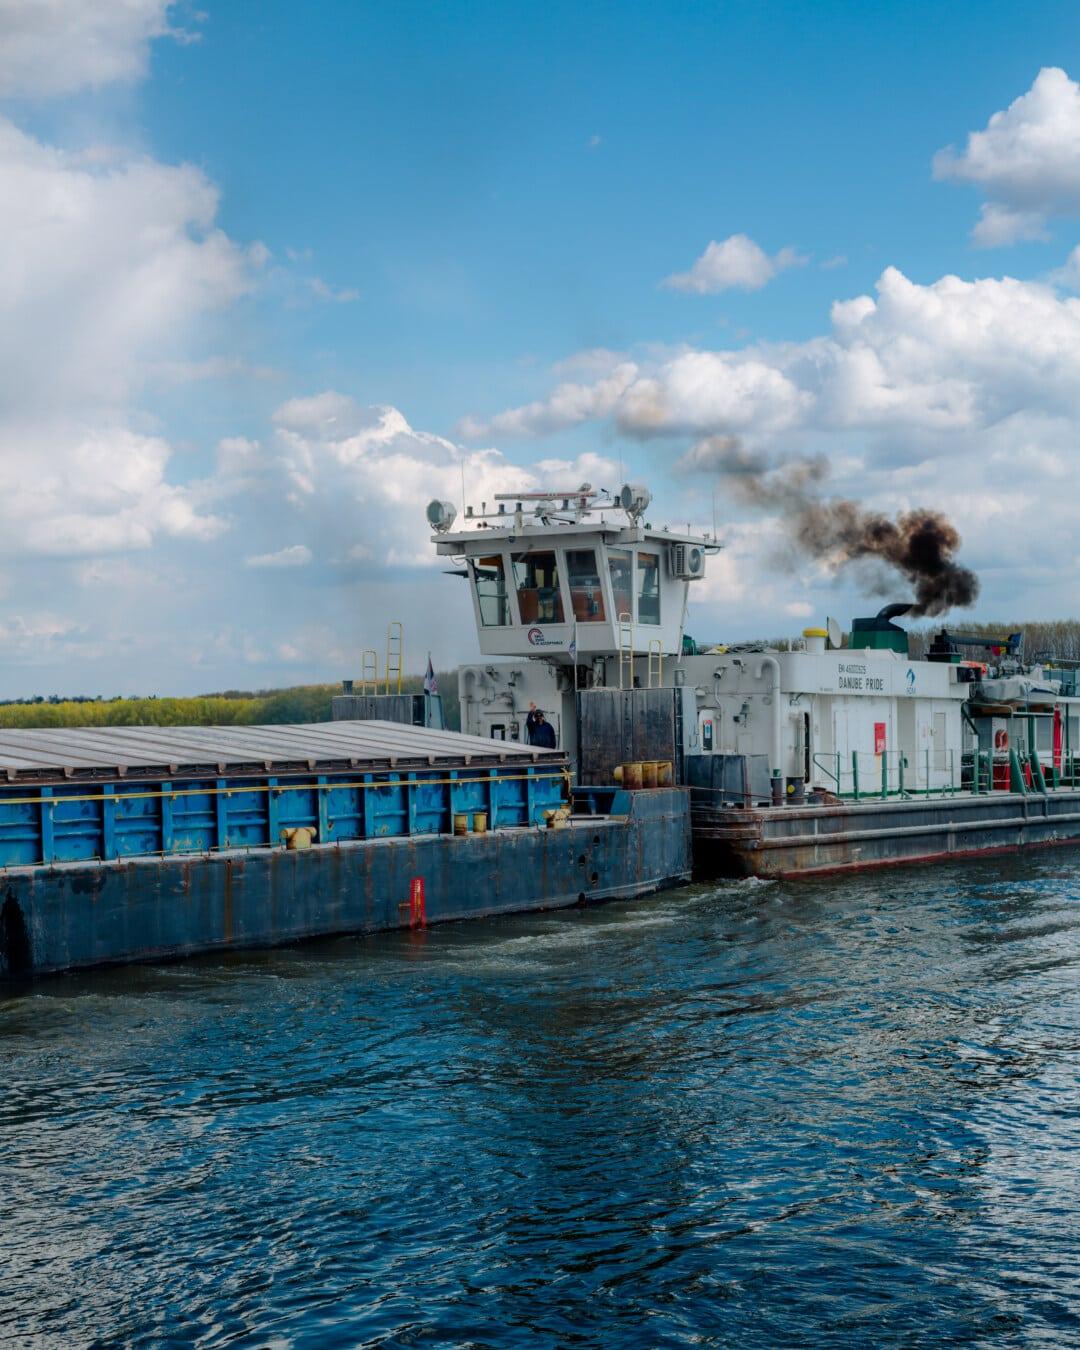 cargo ship, wharf, barge, engine, smoke, diesel, logistics, shipyard, shipment, pier